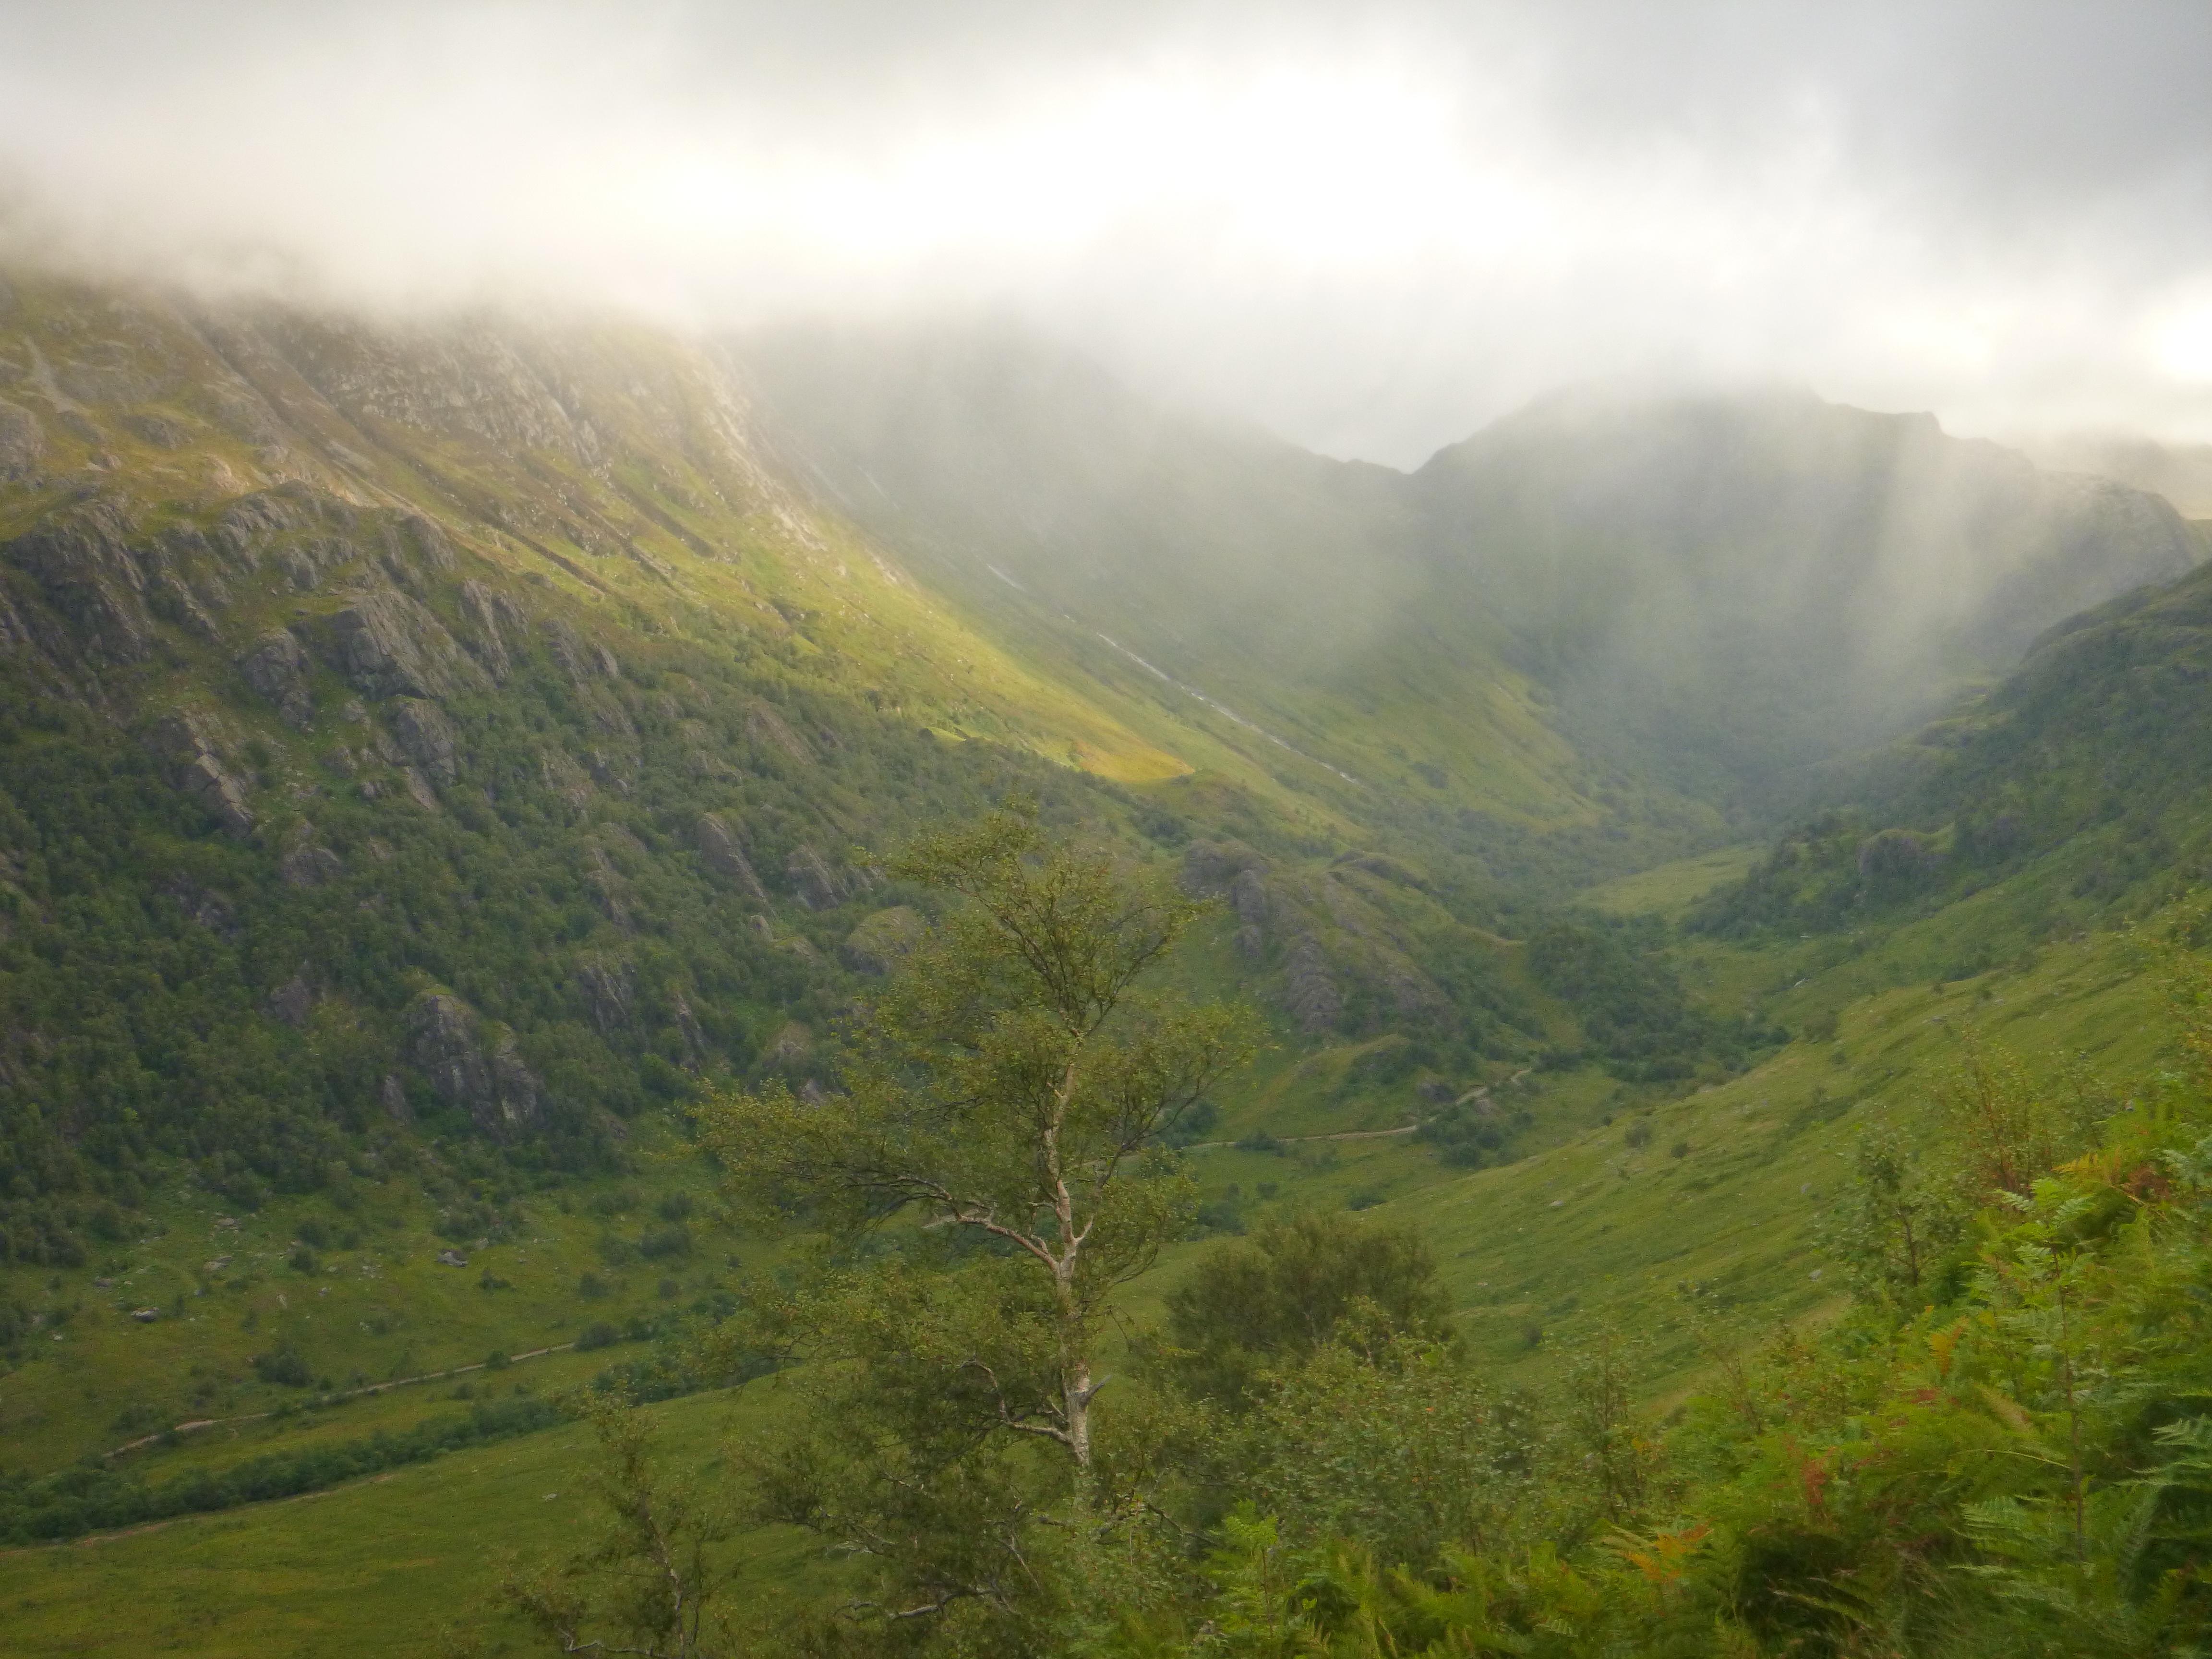 Guided Walks, Guided Hill walks in Lochaber, Glen Nevis Guided walks, Hill walking Guide Scotland, Ring of Steall Guide, Ring of Steall Guided Walk